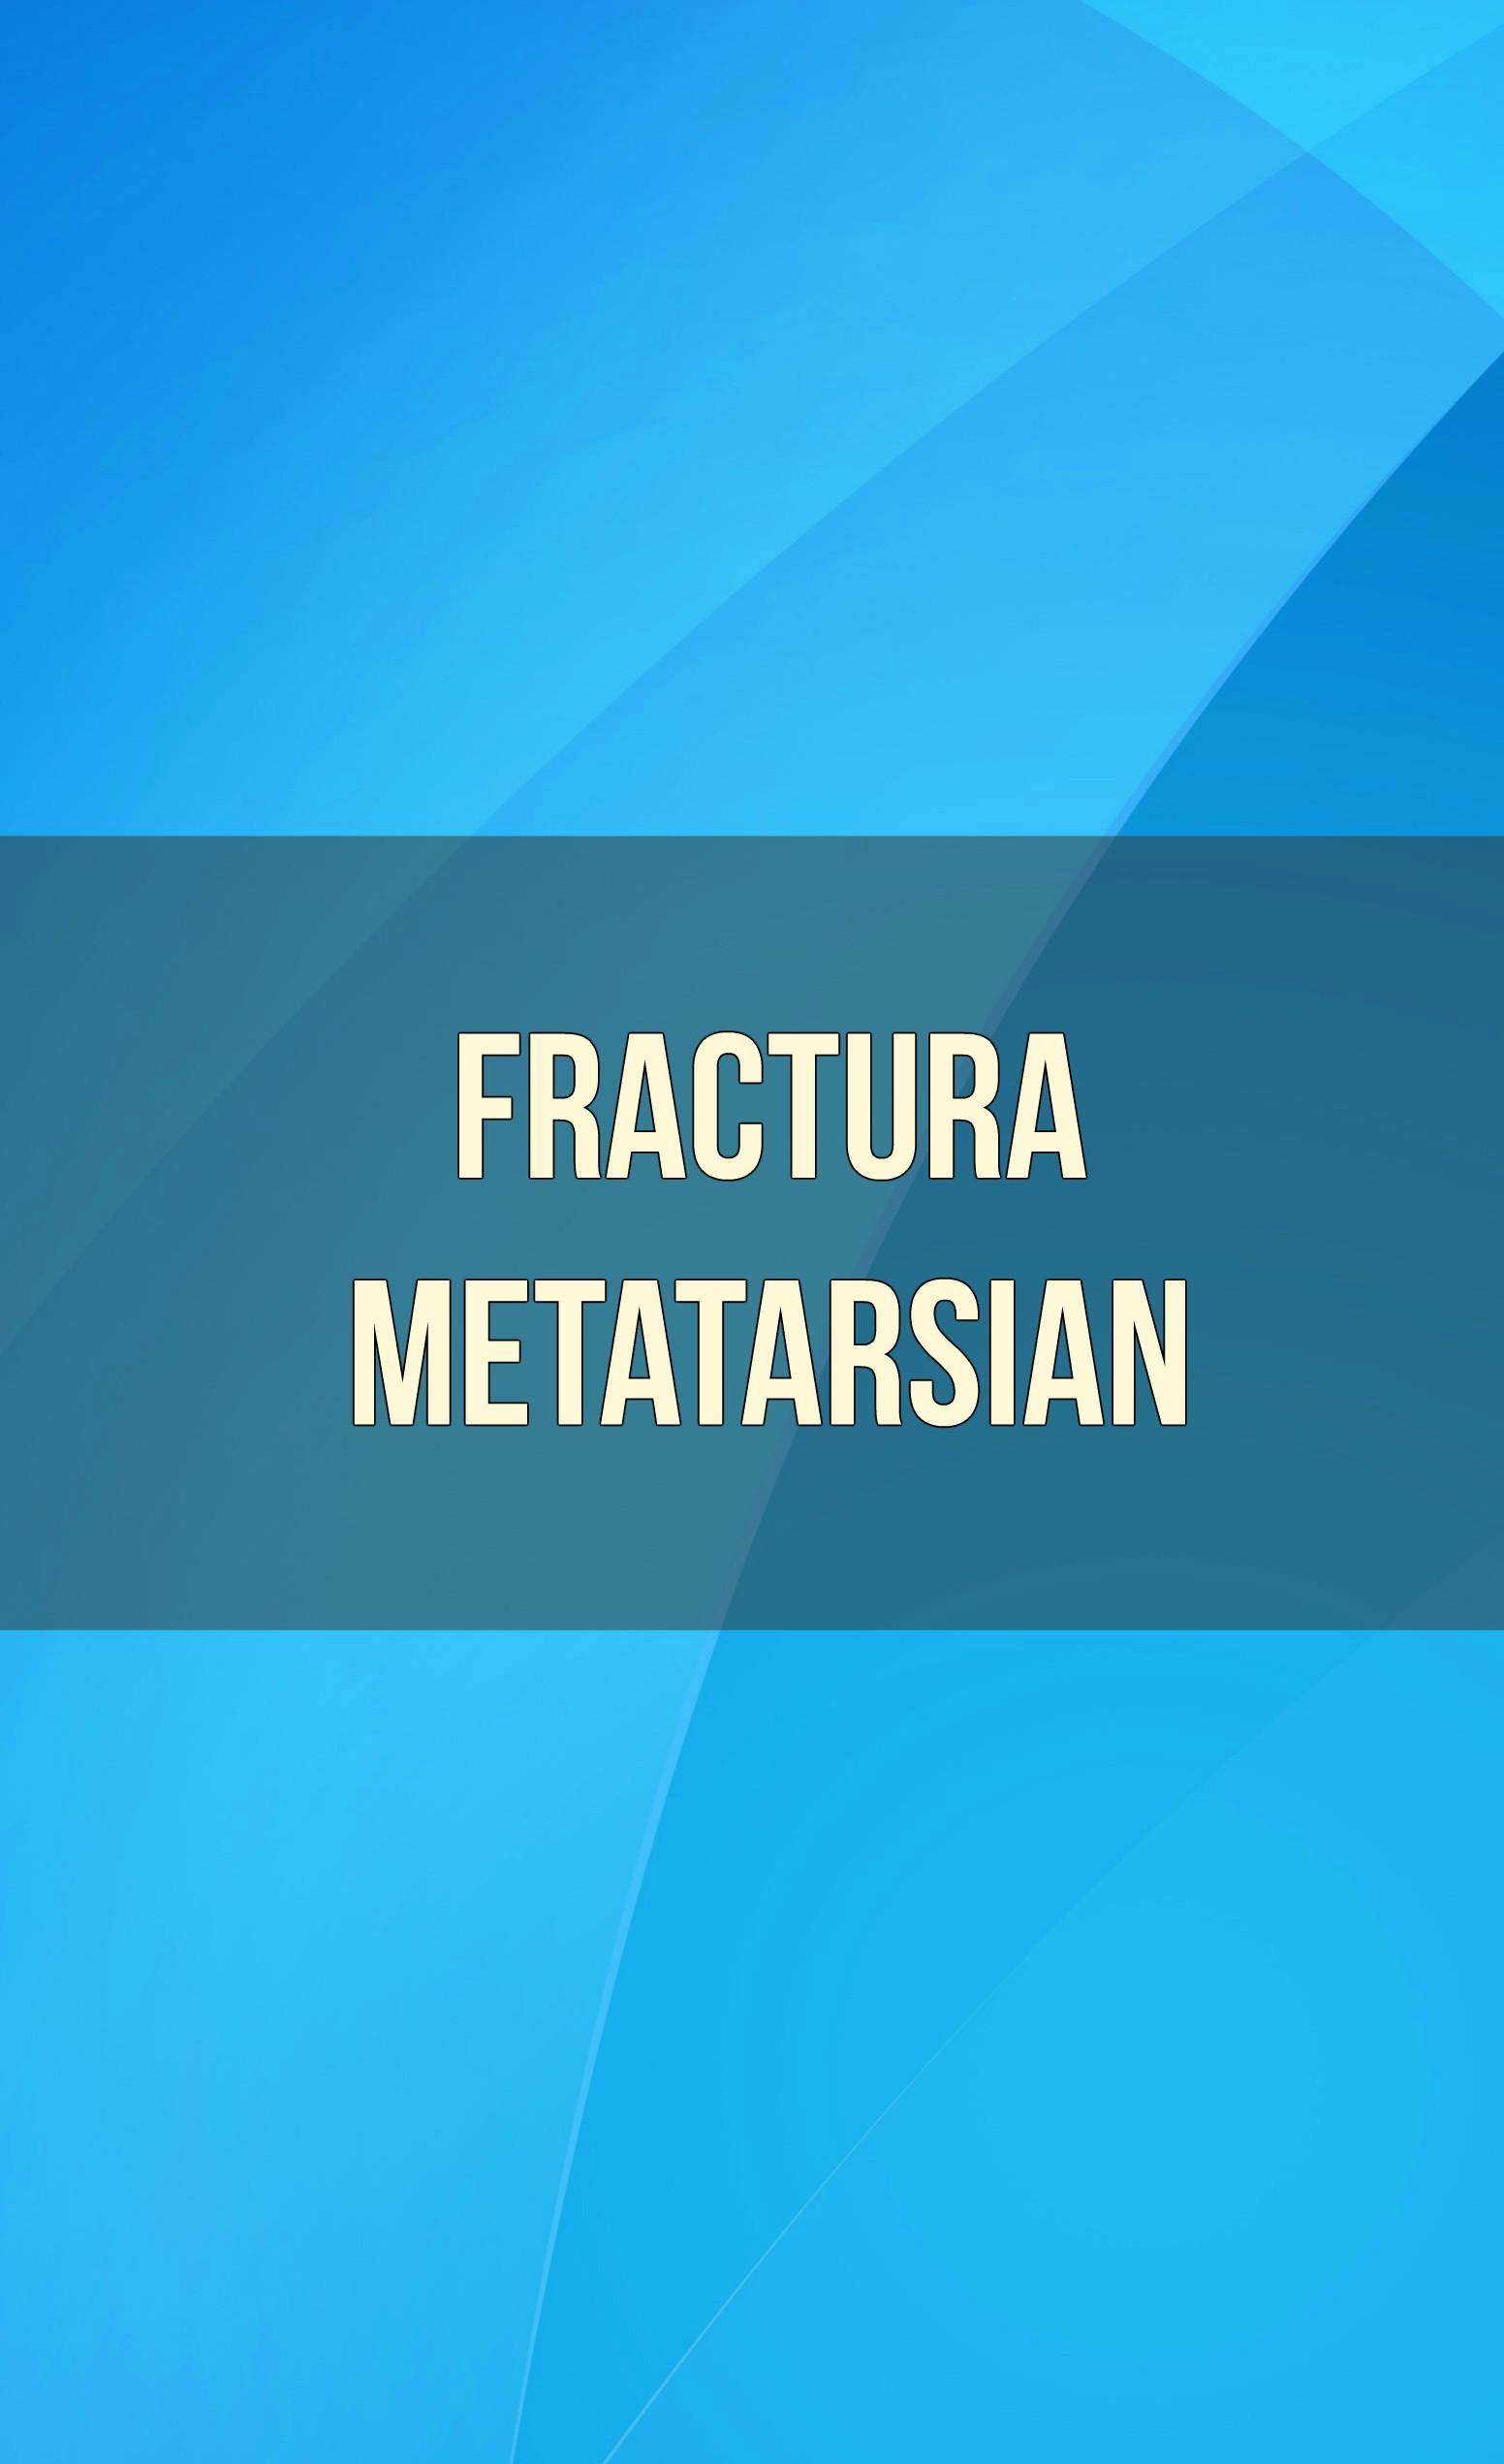 fractura metatarsian